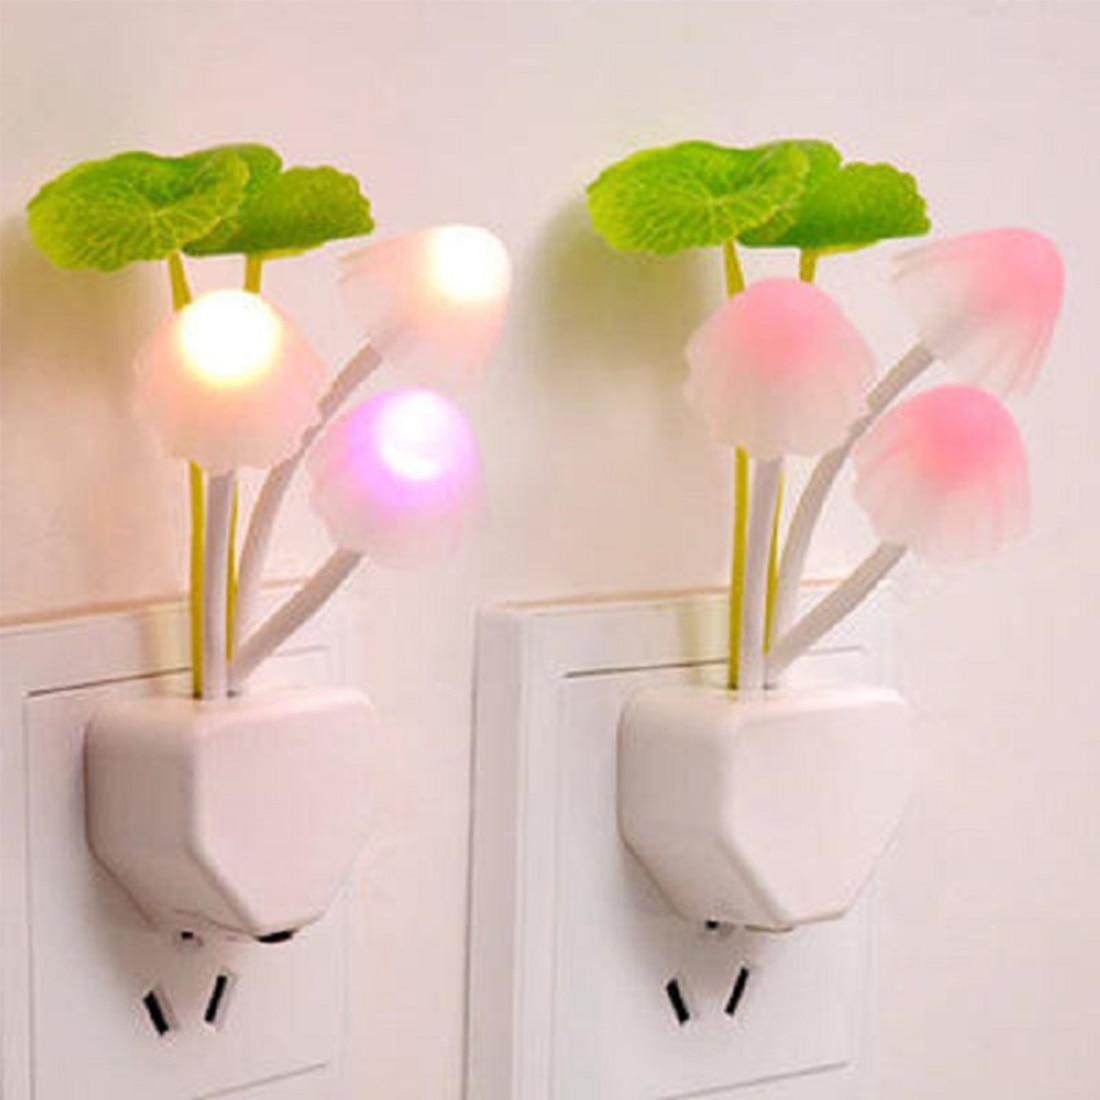 Cute Mushroom Fungus Night Light 220V 3 LED EU & US Plug Light Sensor Colorful Lamp Led Night Lights Home Decor for Children